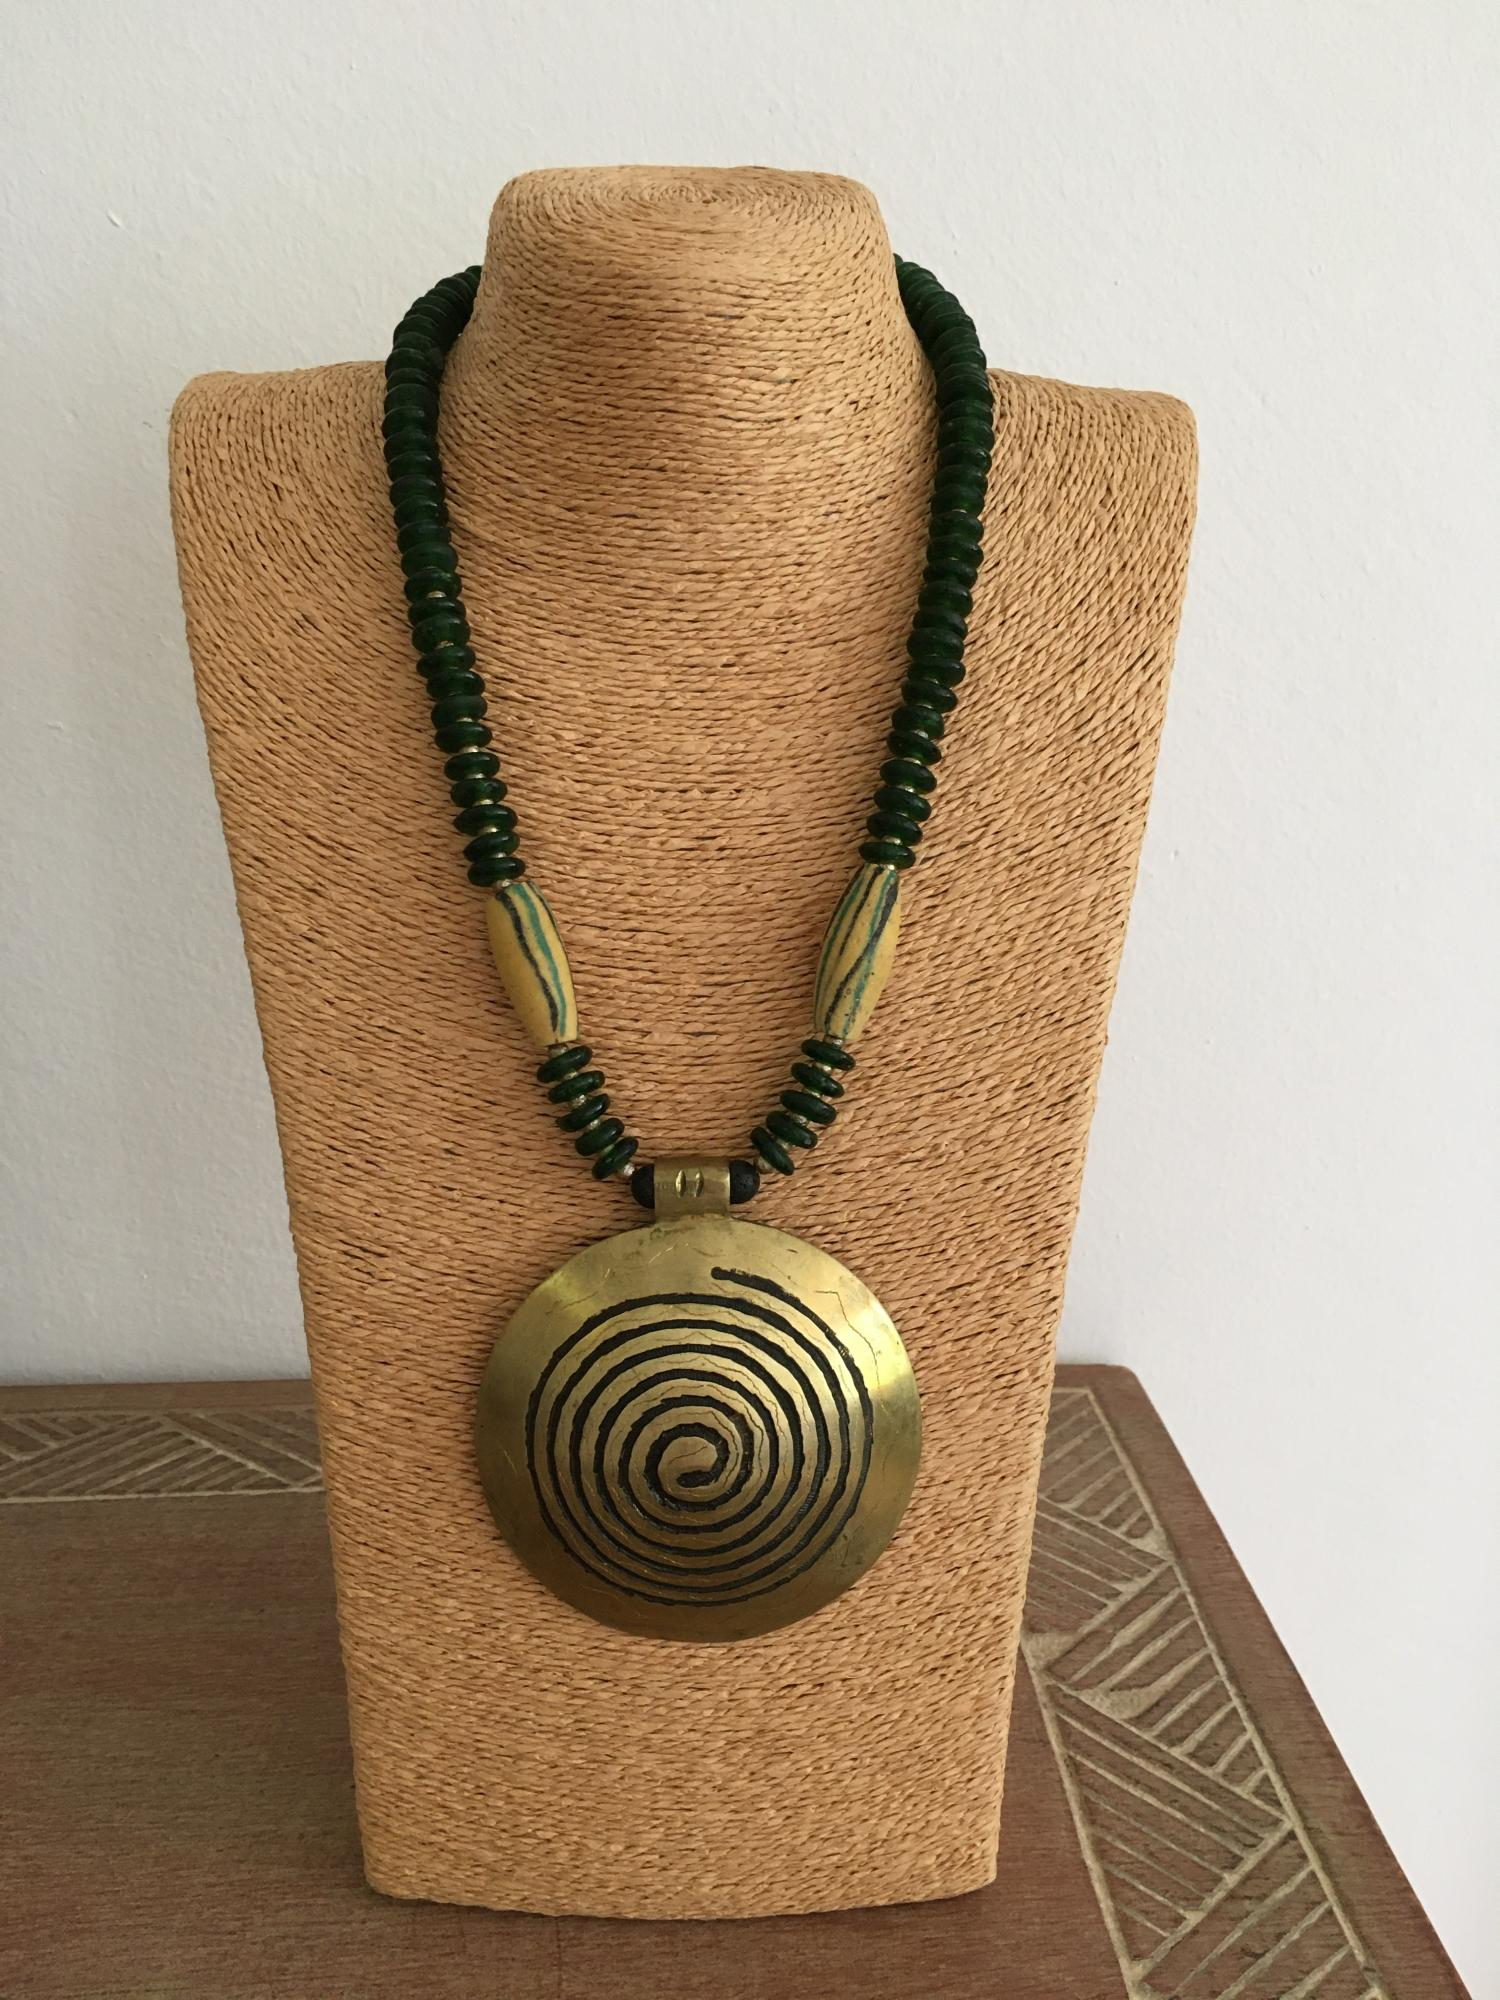 Tuareghandwerk-Ashantiglas-Krobobeads-African Beads Design